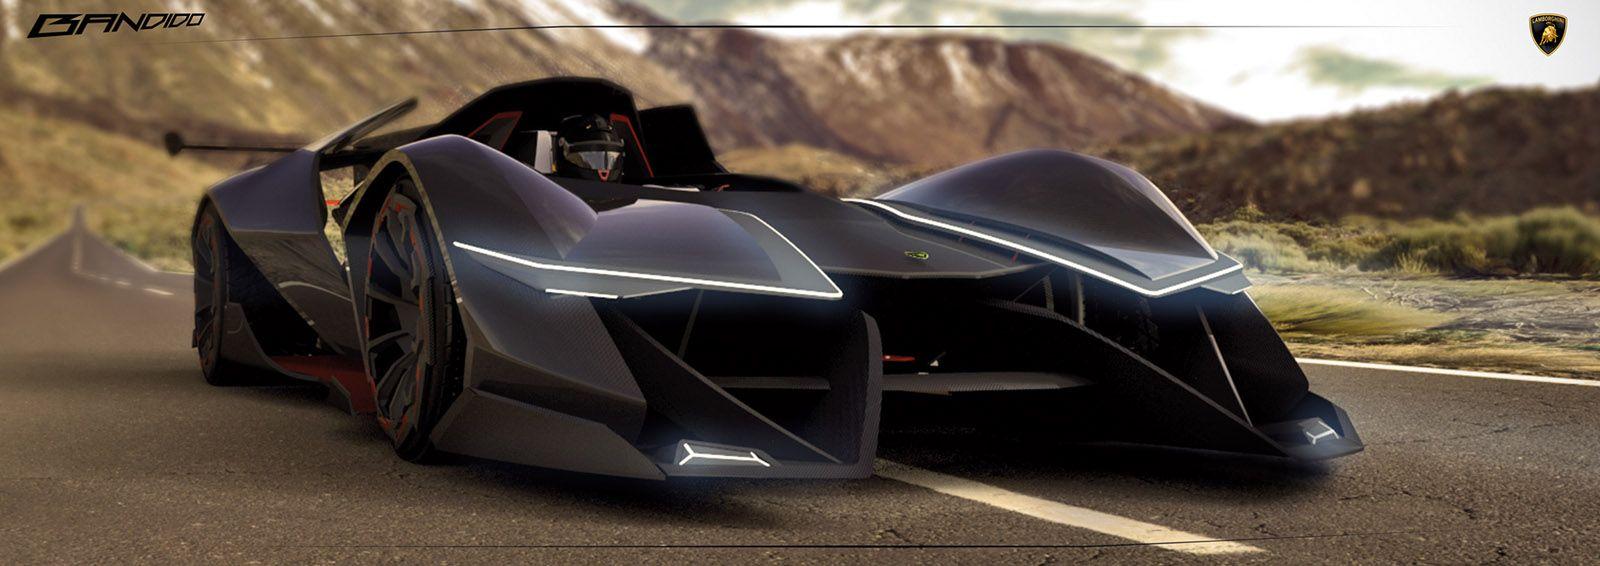 the 2030 lamborghini bandido concept envisions the electric powered single seater supercar of the future